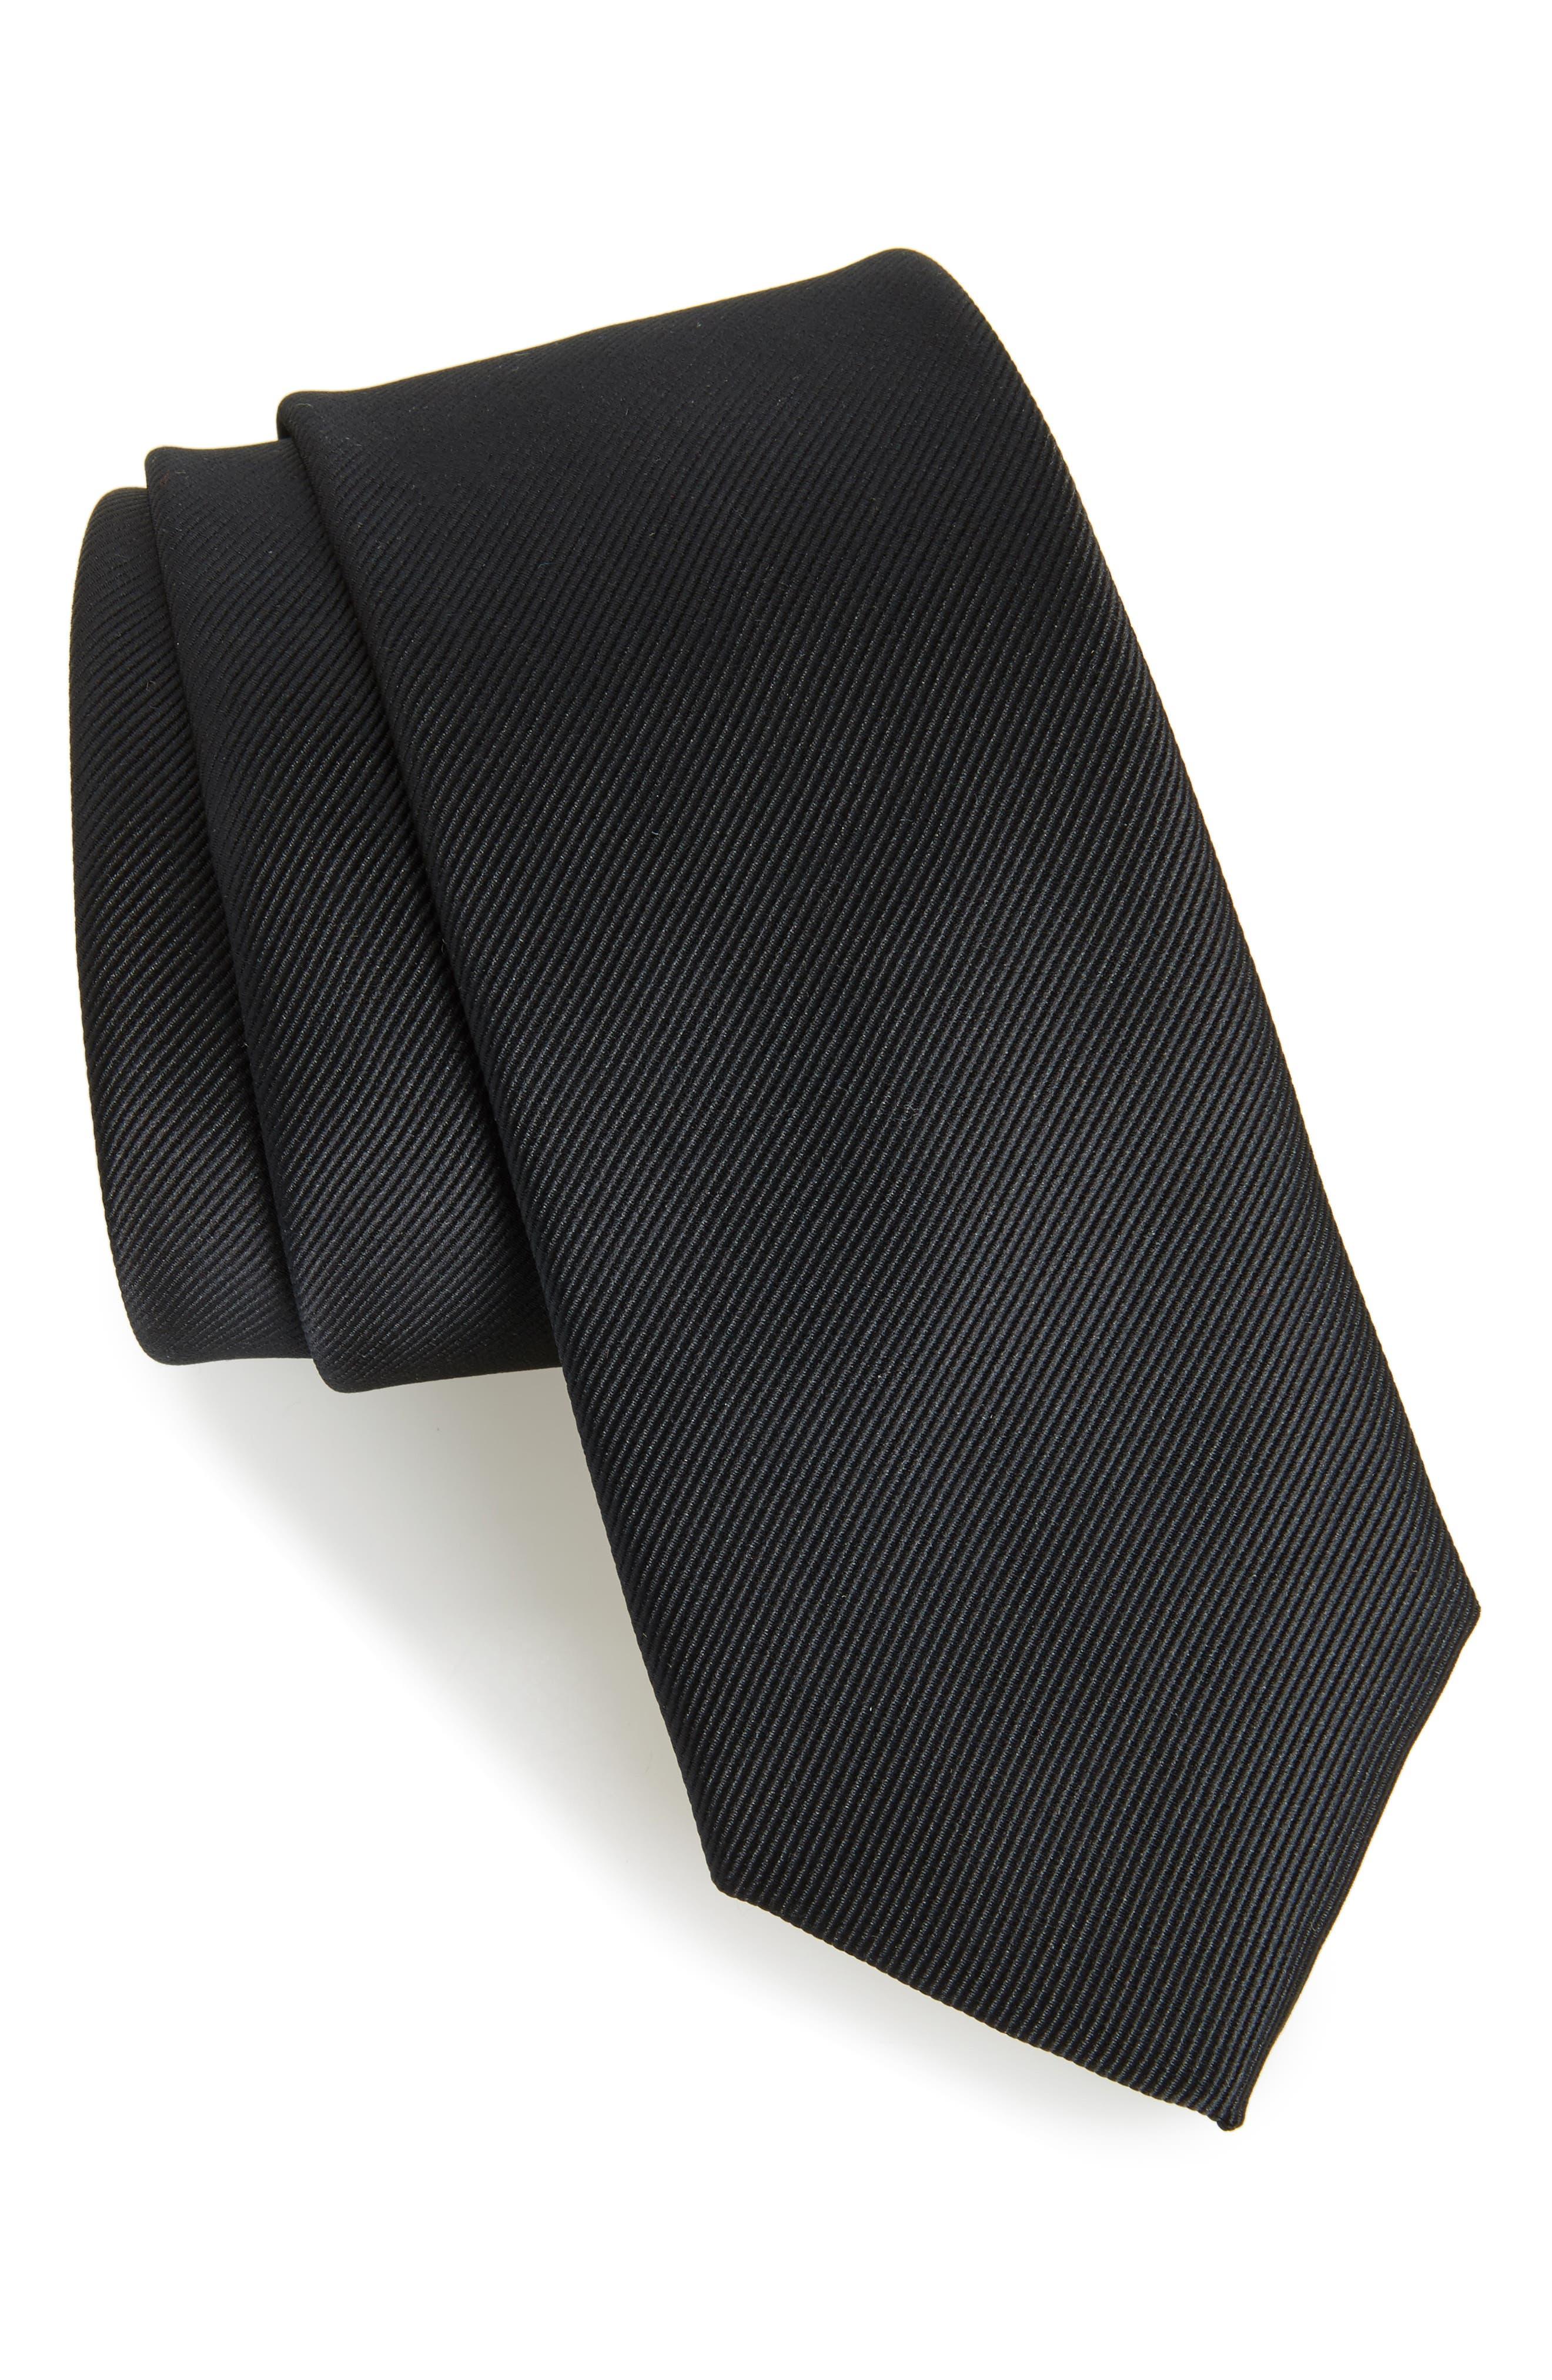 Main Image - Topman Black Woven Tie